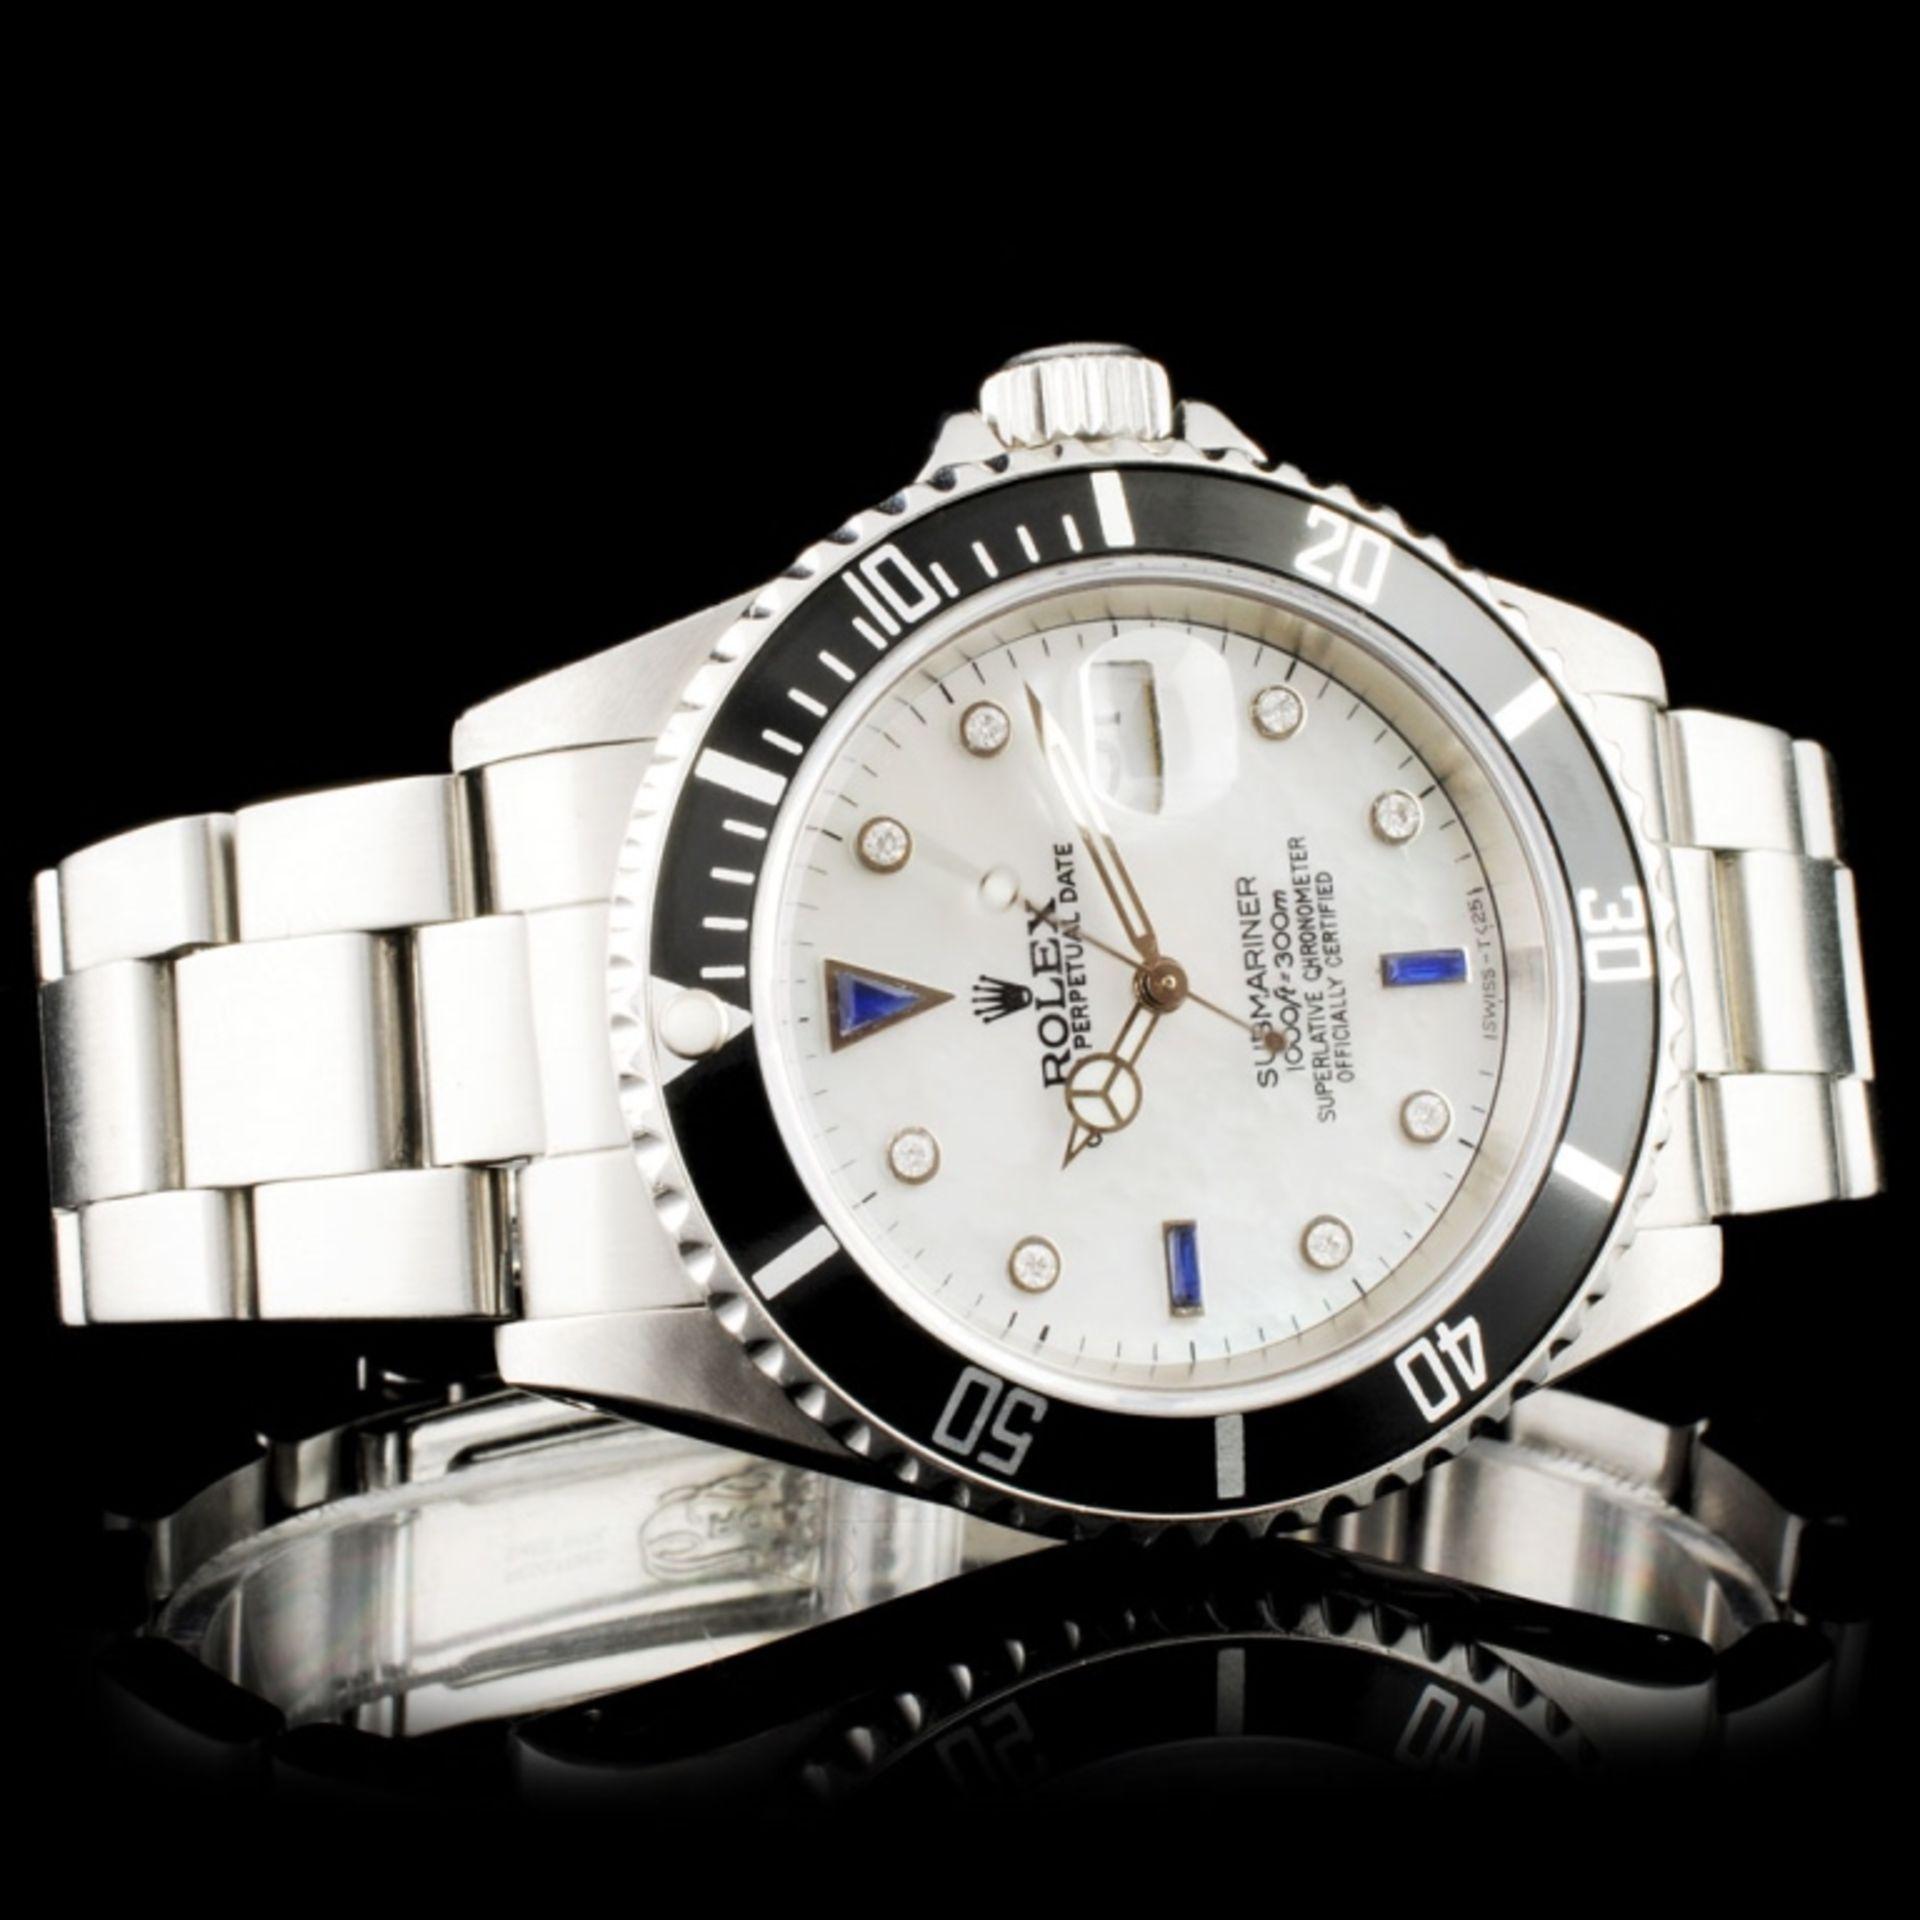 Rolex Submariner SS 40MM Diamond Wristwatch - Image 3 of 7